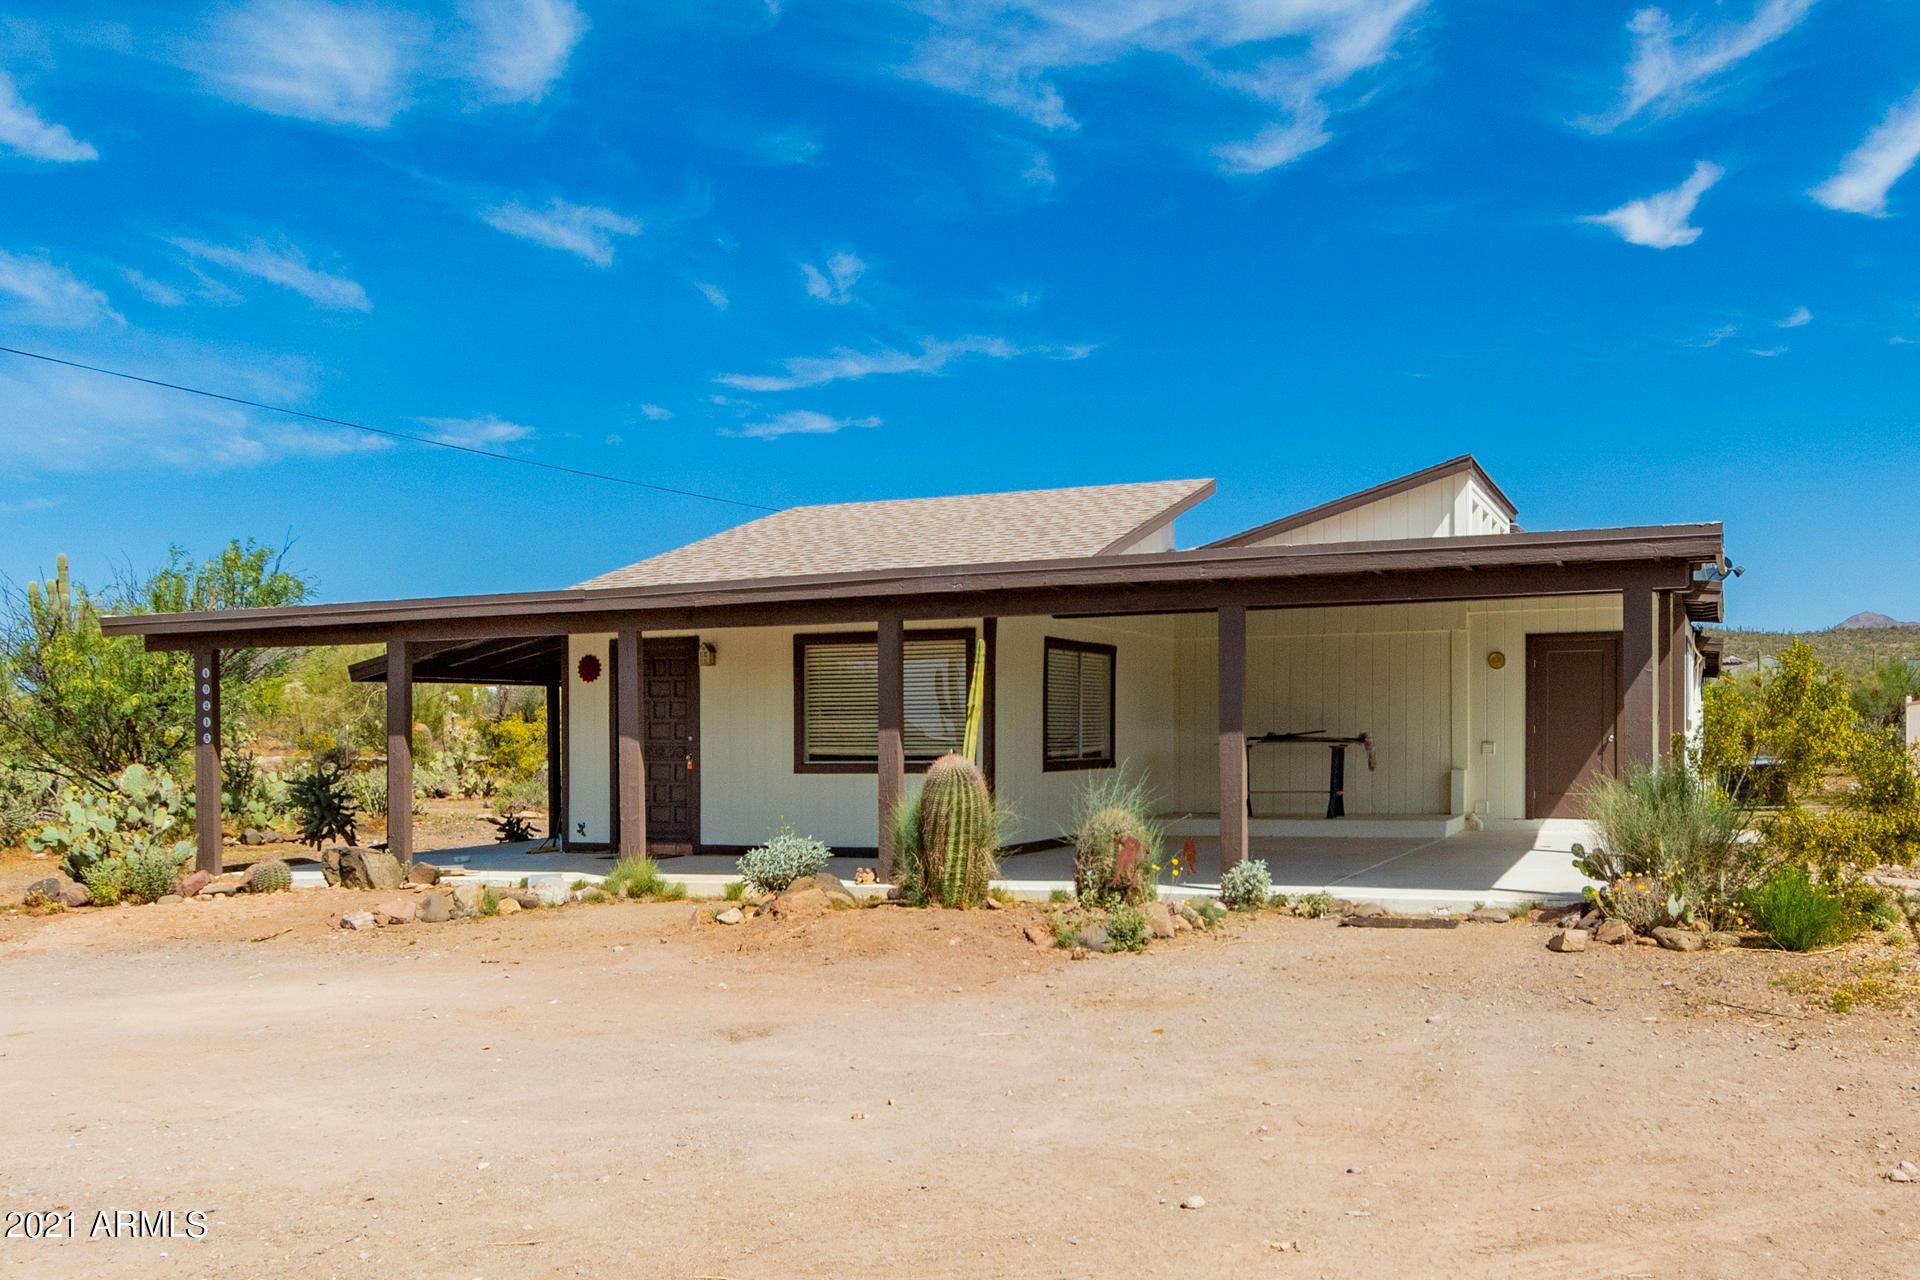 Photo of 49215 N 3RD Avenue, New River, AZ 85087 (MLS # 6259888)